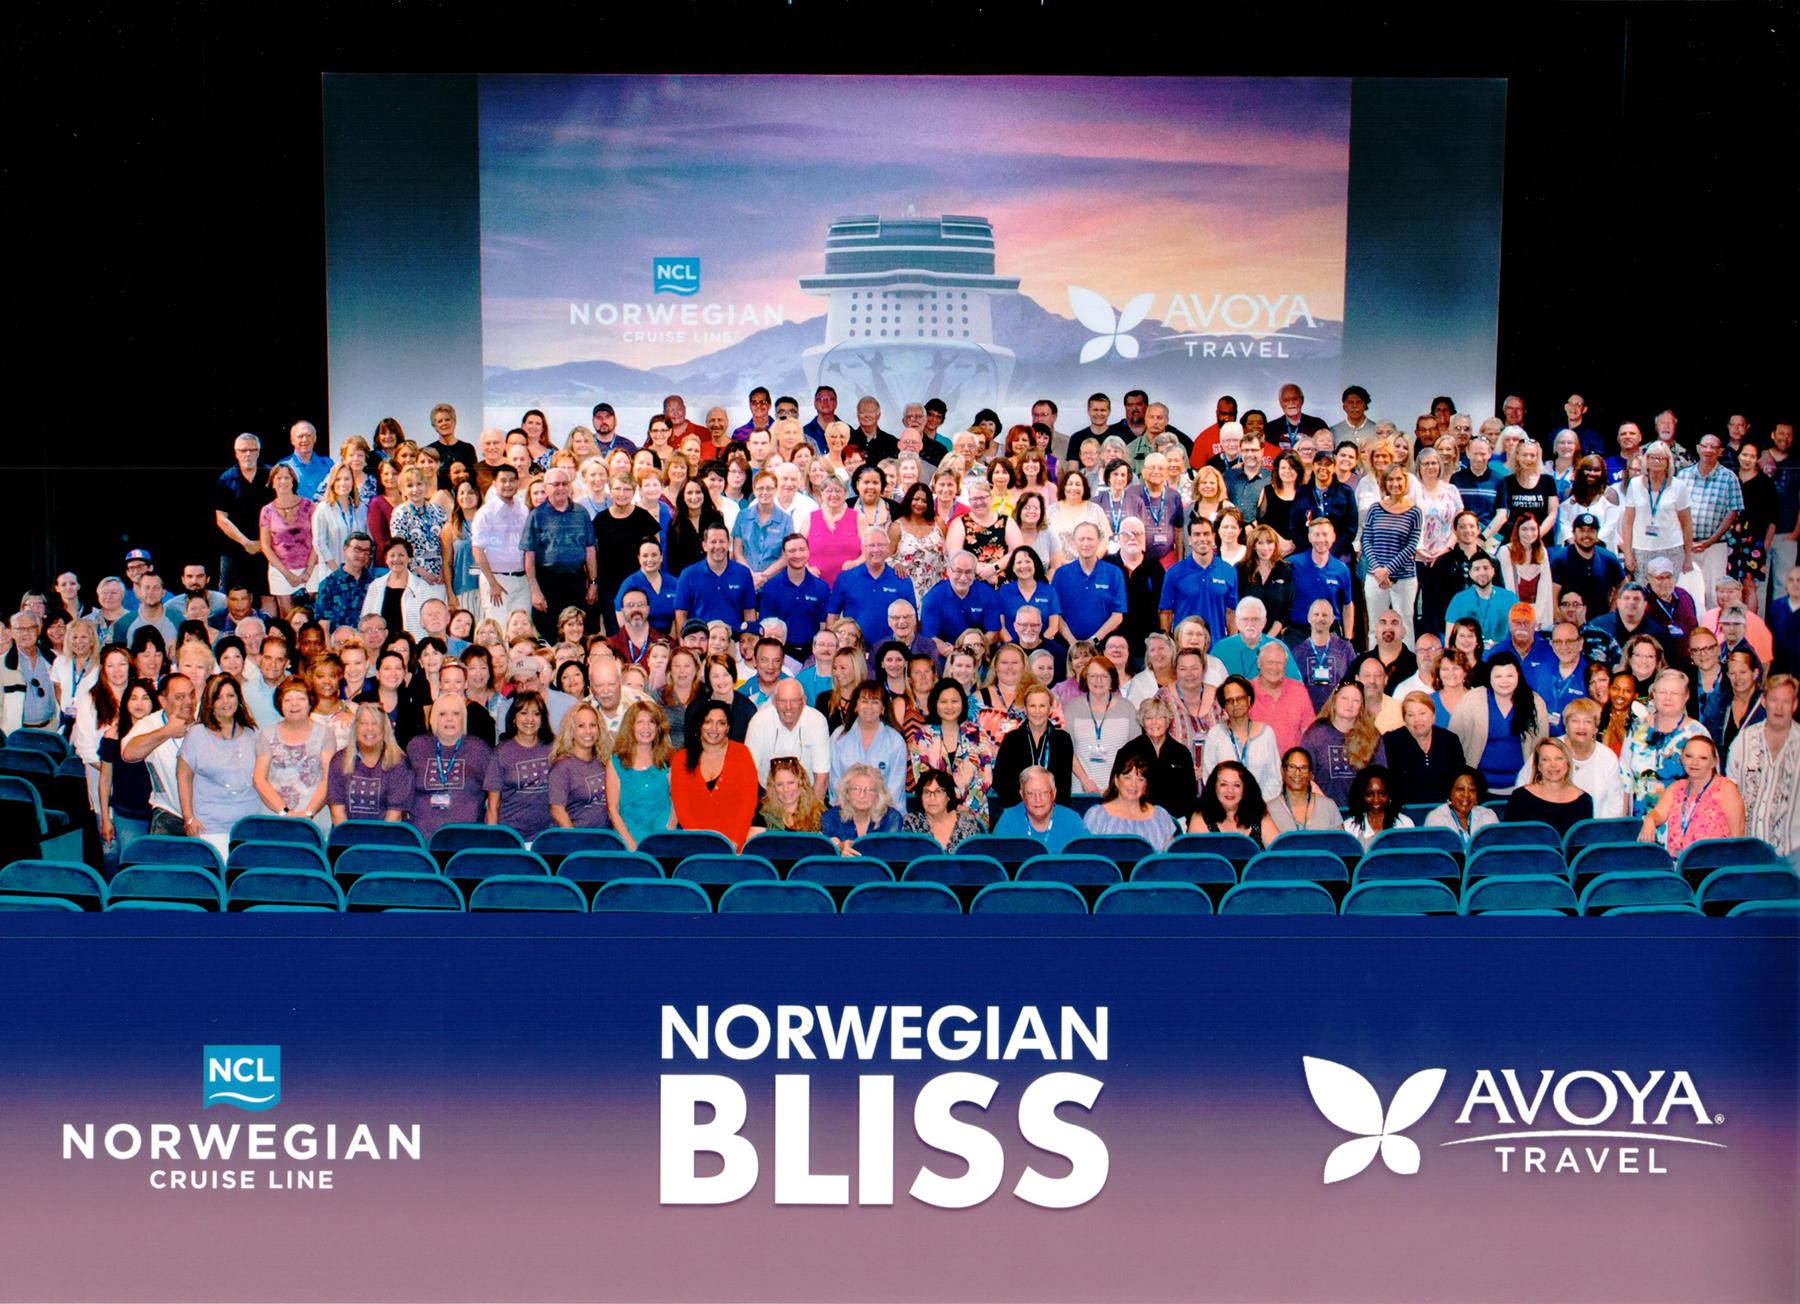 Avoya Conference Attendees Onboard Norwegian Bliss